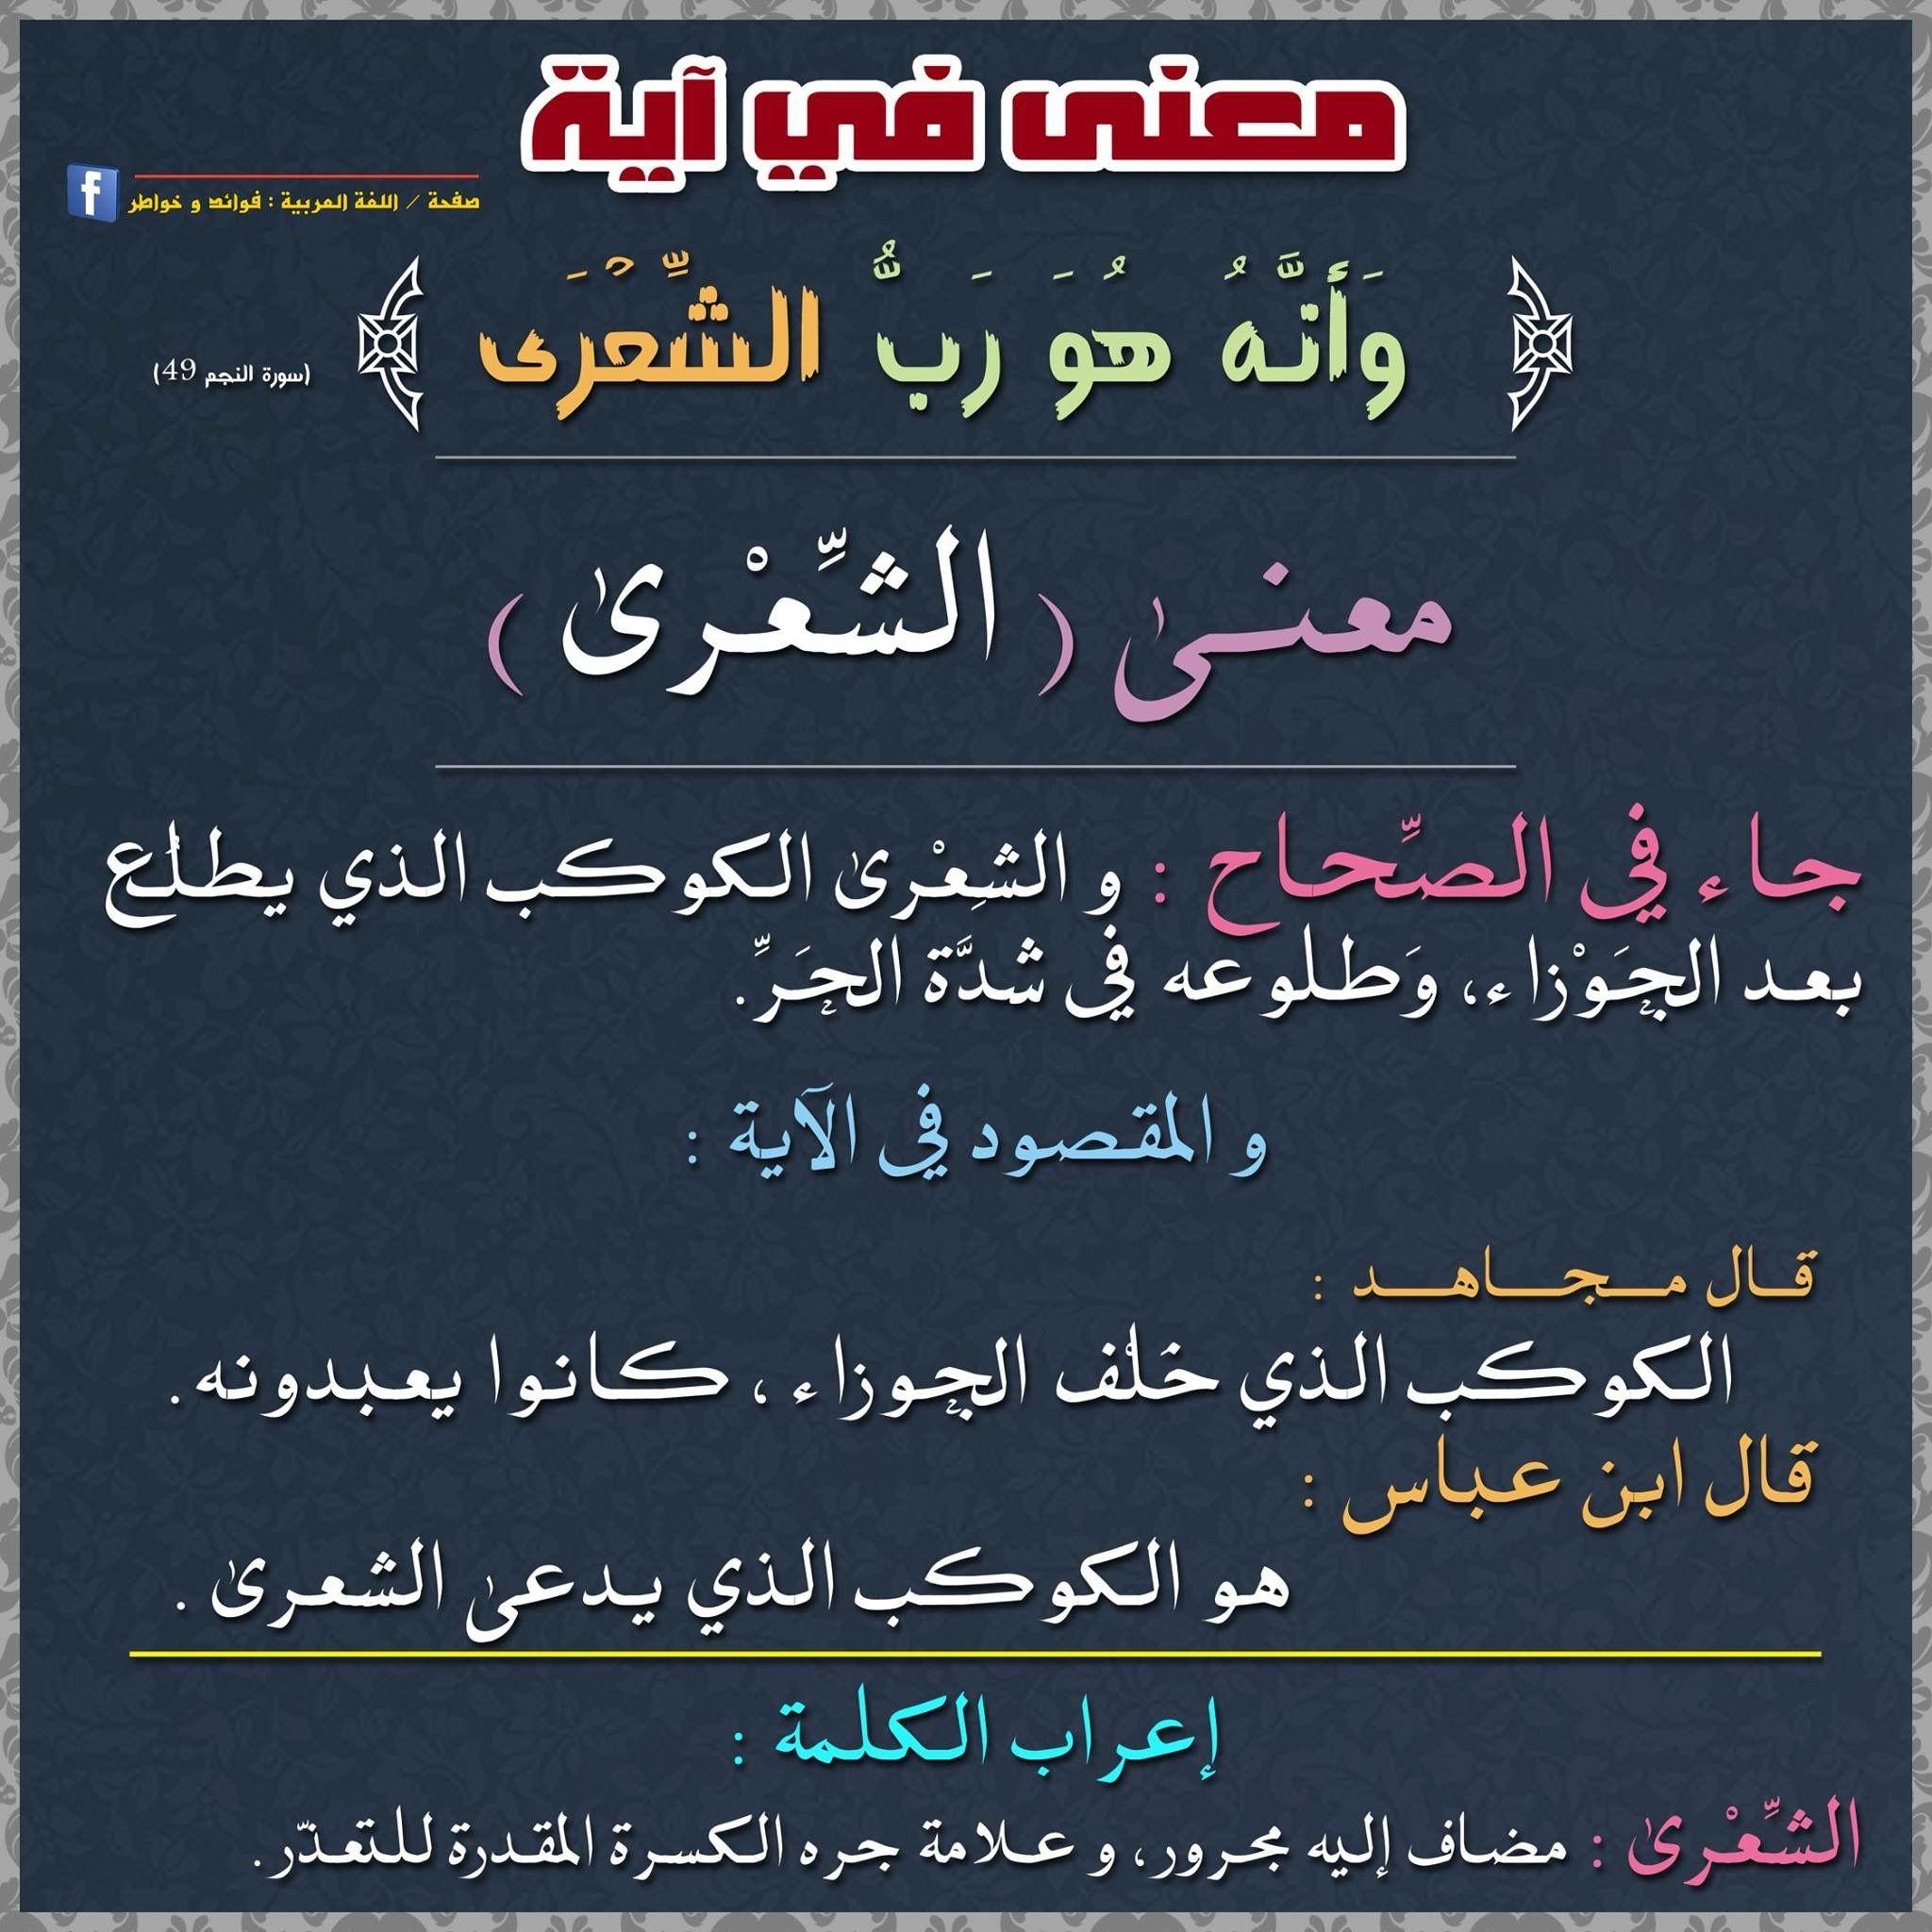 الشعرى Learn Arabic Language Islamic Messages Islamic Quotes